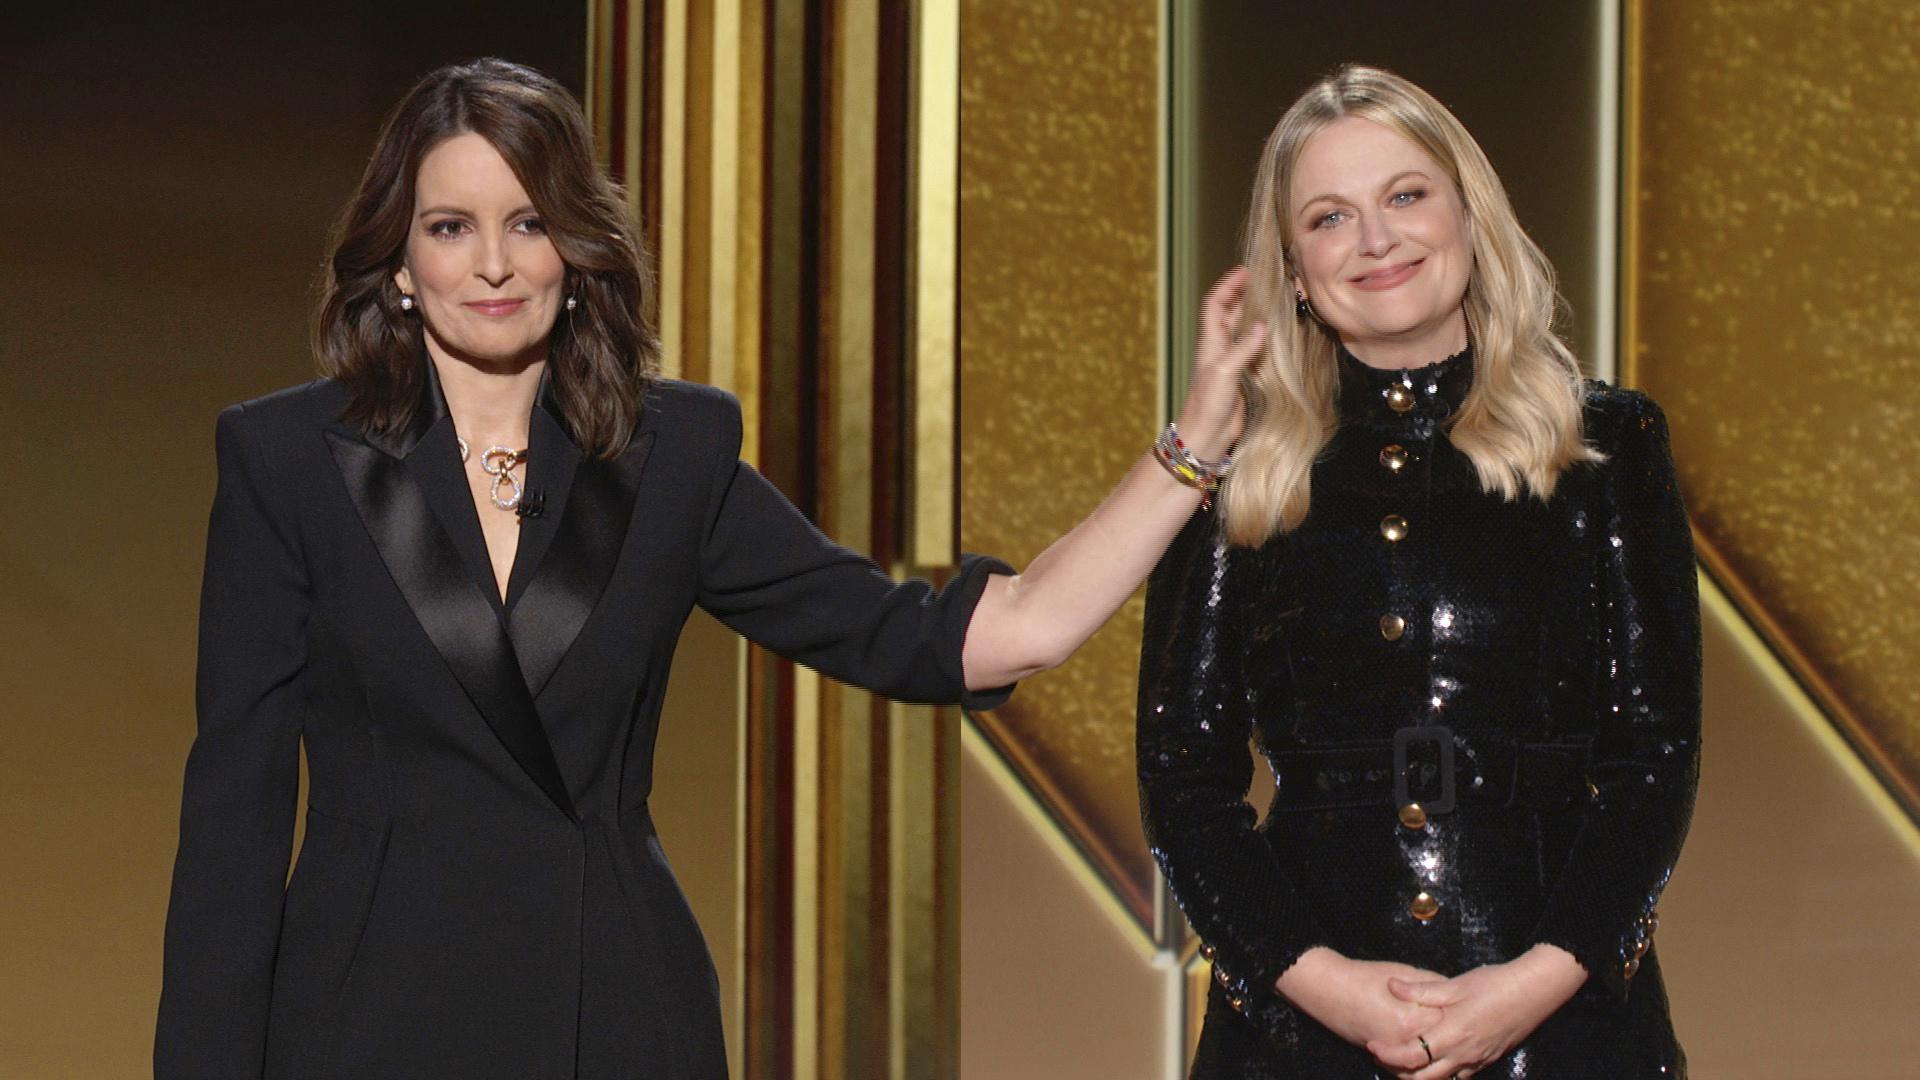 Golden Globe Awards - Season 78